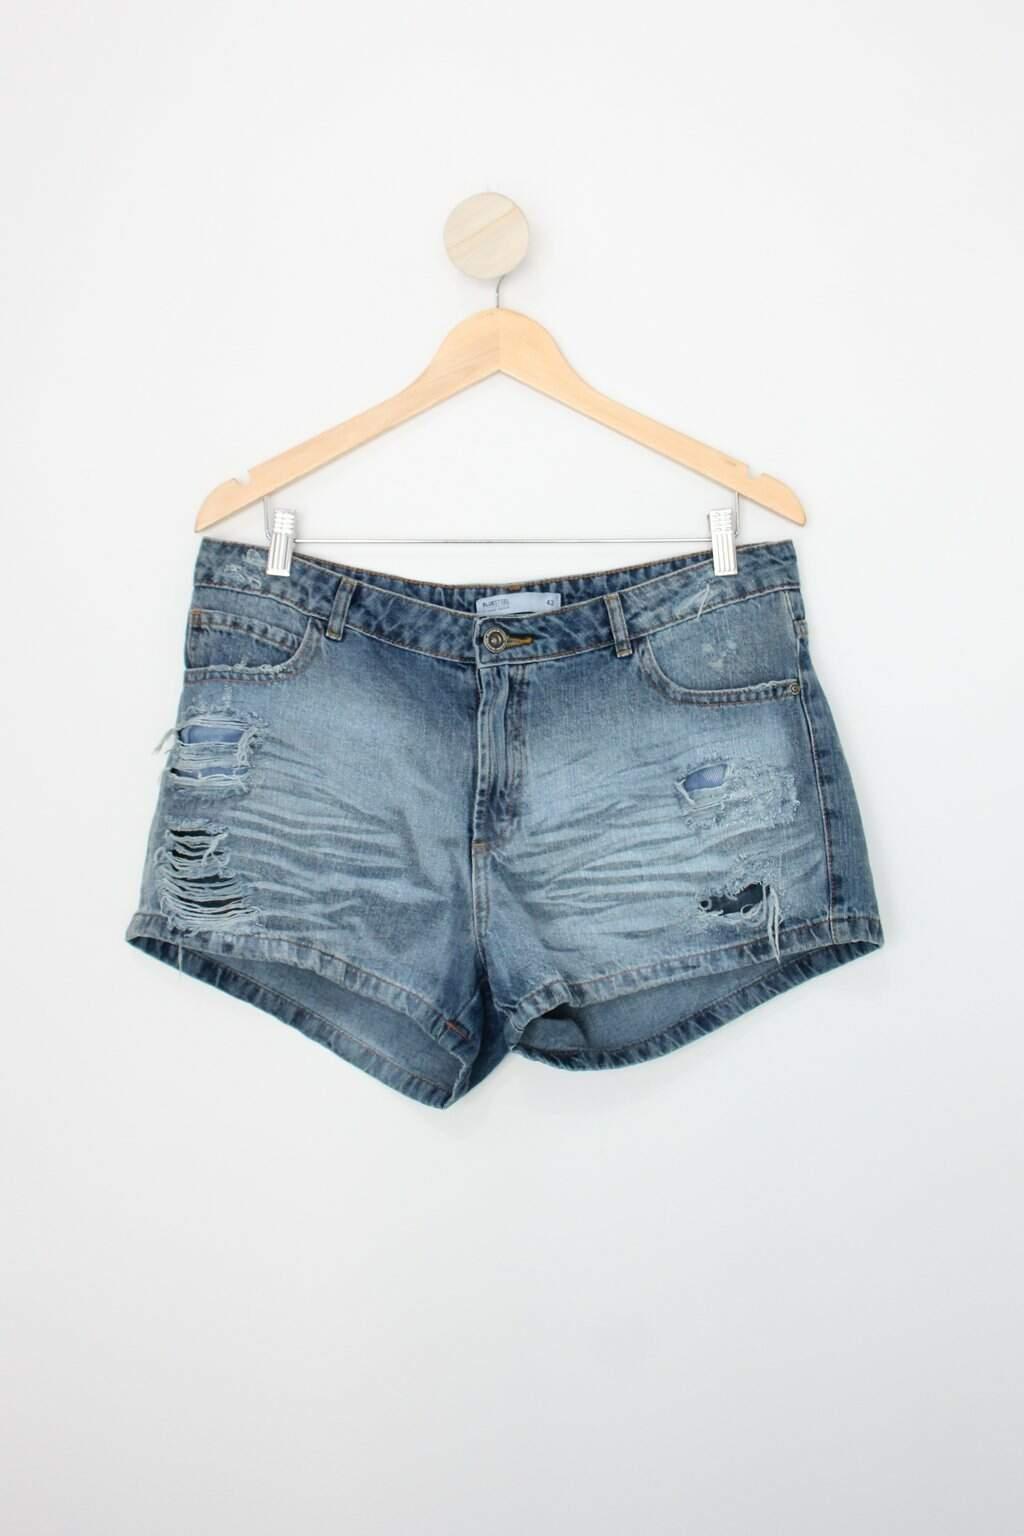 Shorts Renner Feminina Azul Jeans